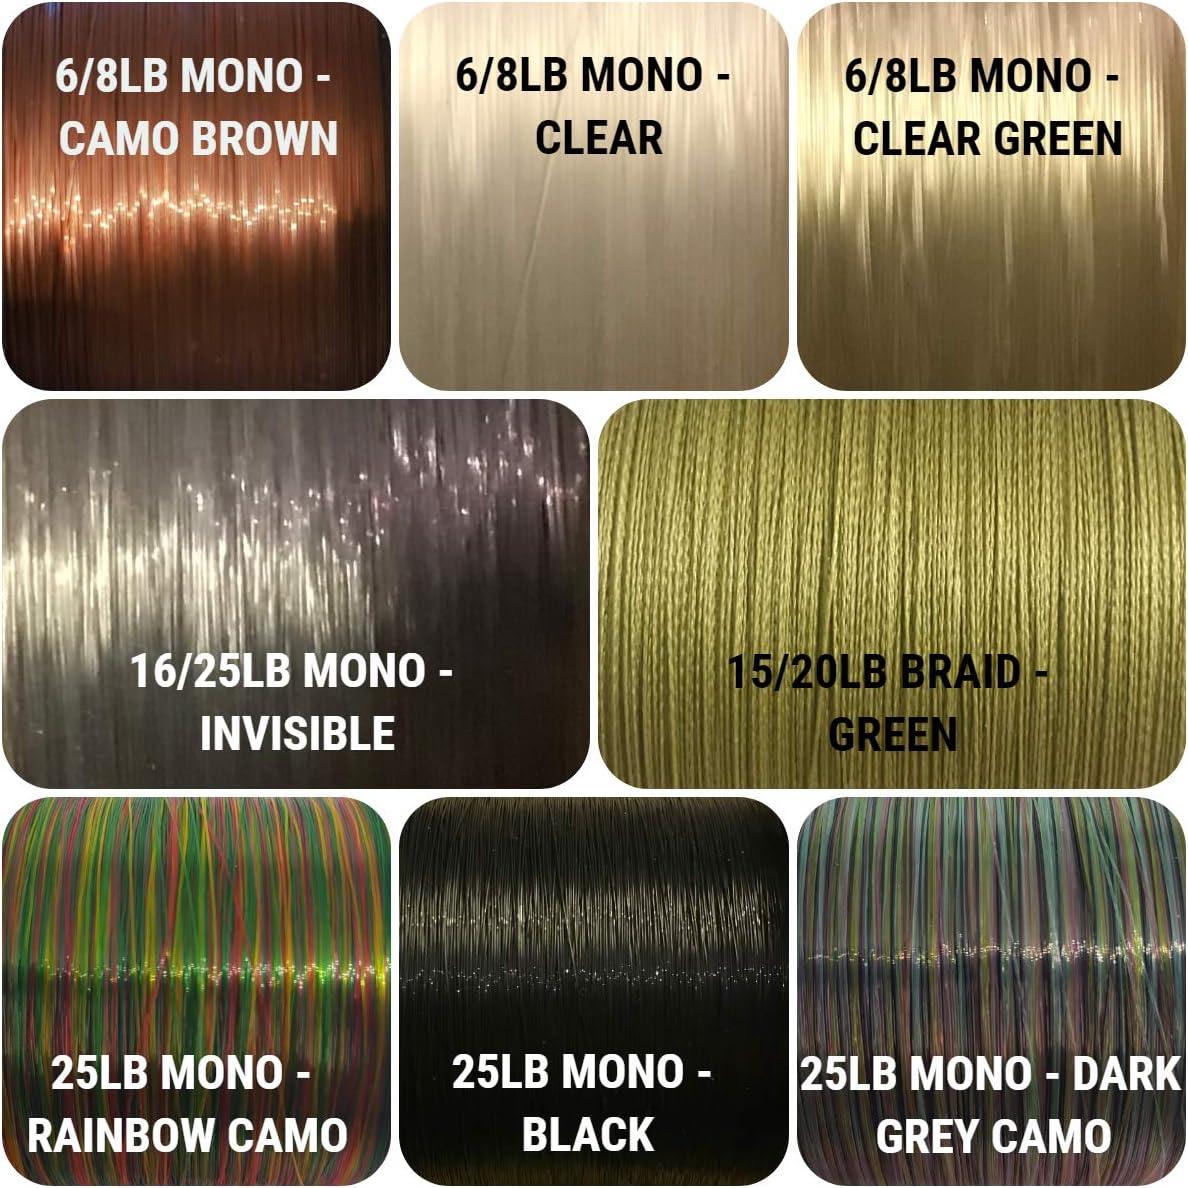 MONO 10 x KD HAIR RIGS VARIATIONS FLYNSCOTSMAN TACKLE FISHING COARSE BRAID